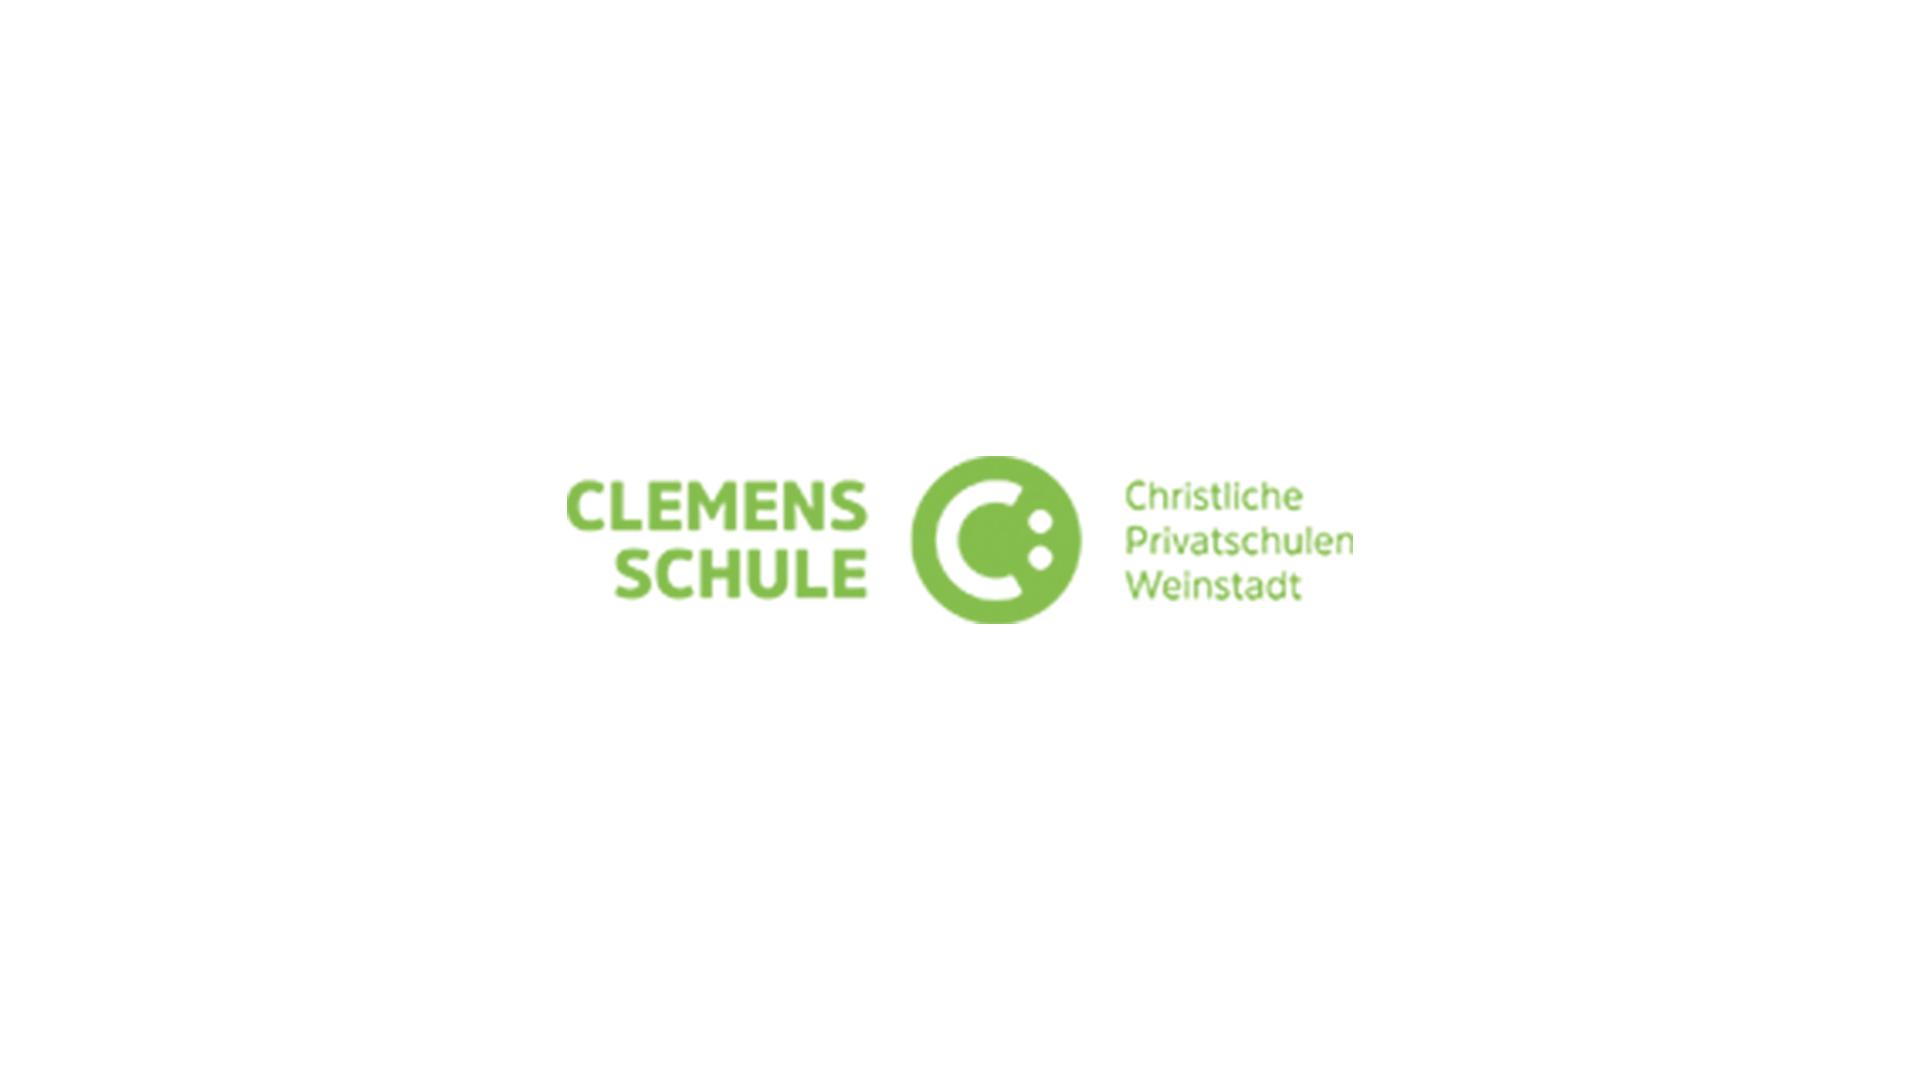 Pfleiderer Projektbau: Sponsoring Clemens Schule